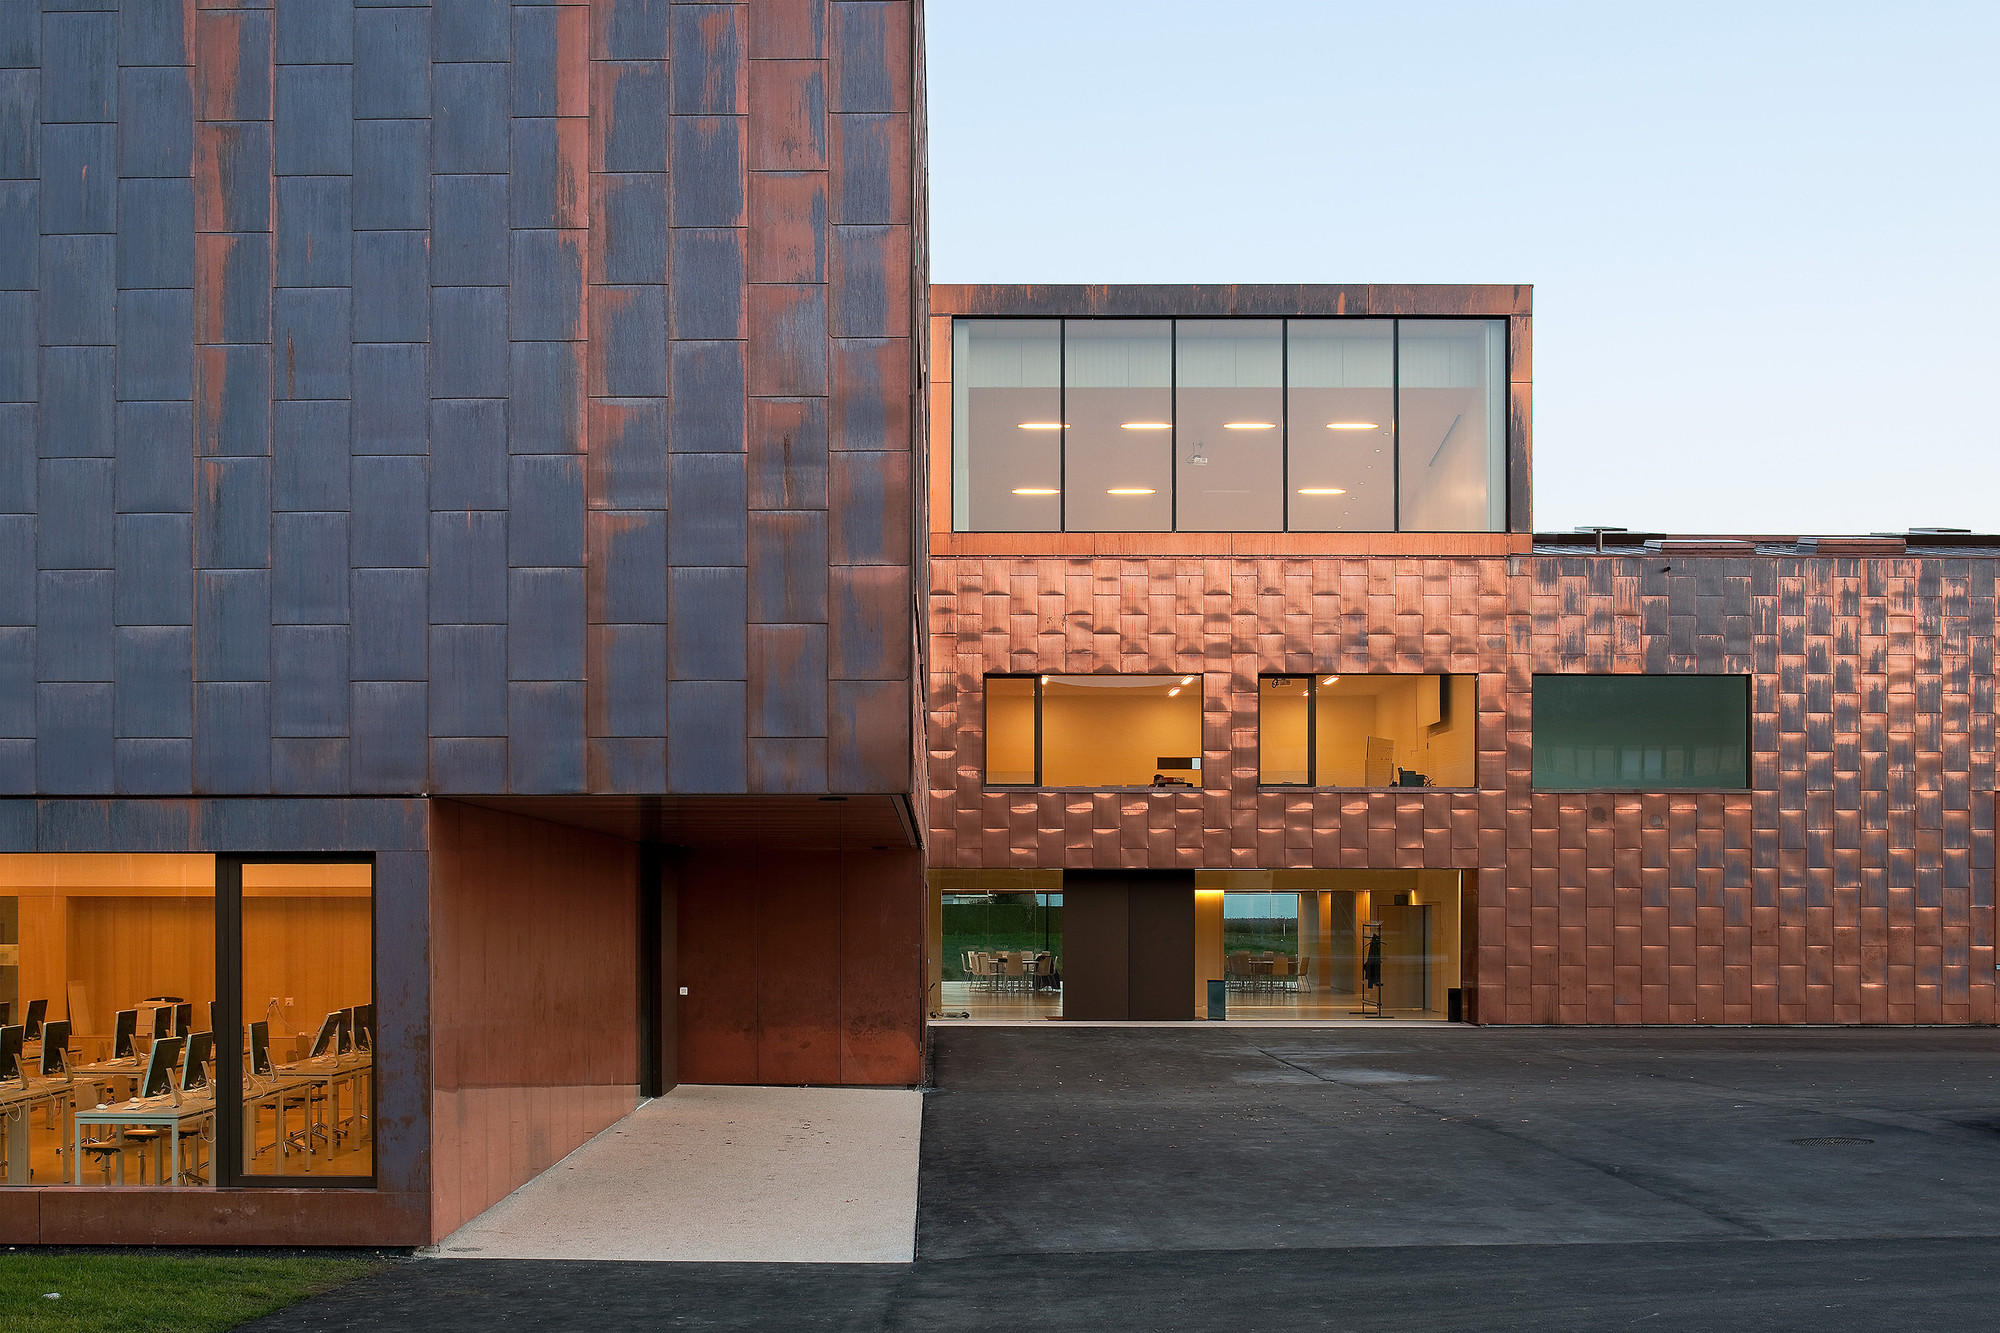 Salón deportivo multiuso y escuela secundaria Collège du Léman / Graeme Mann & Patricia Capua Mann, © Thomas Jantscher